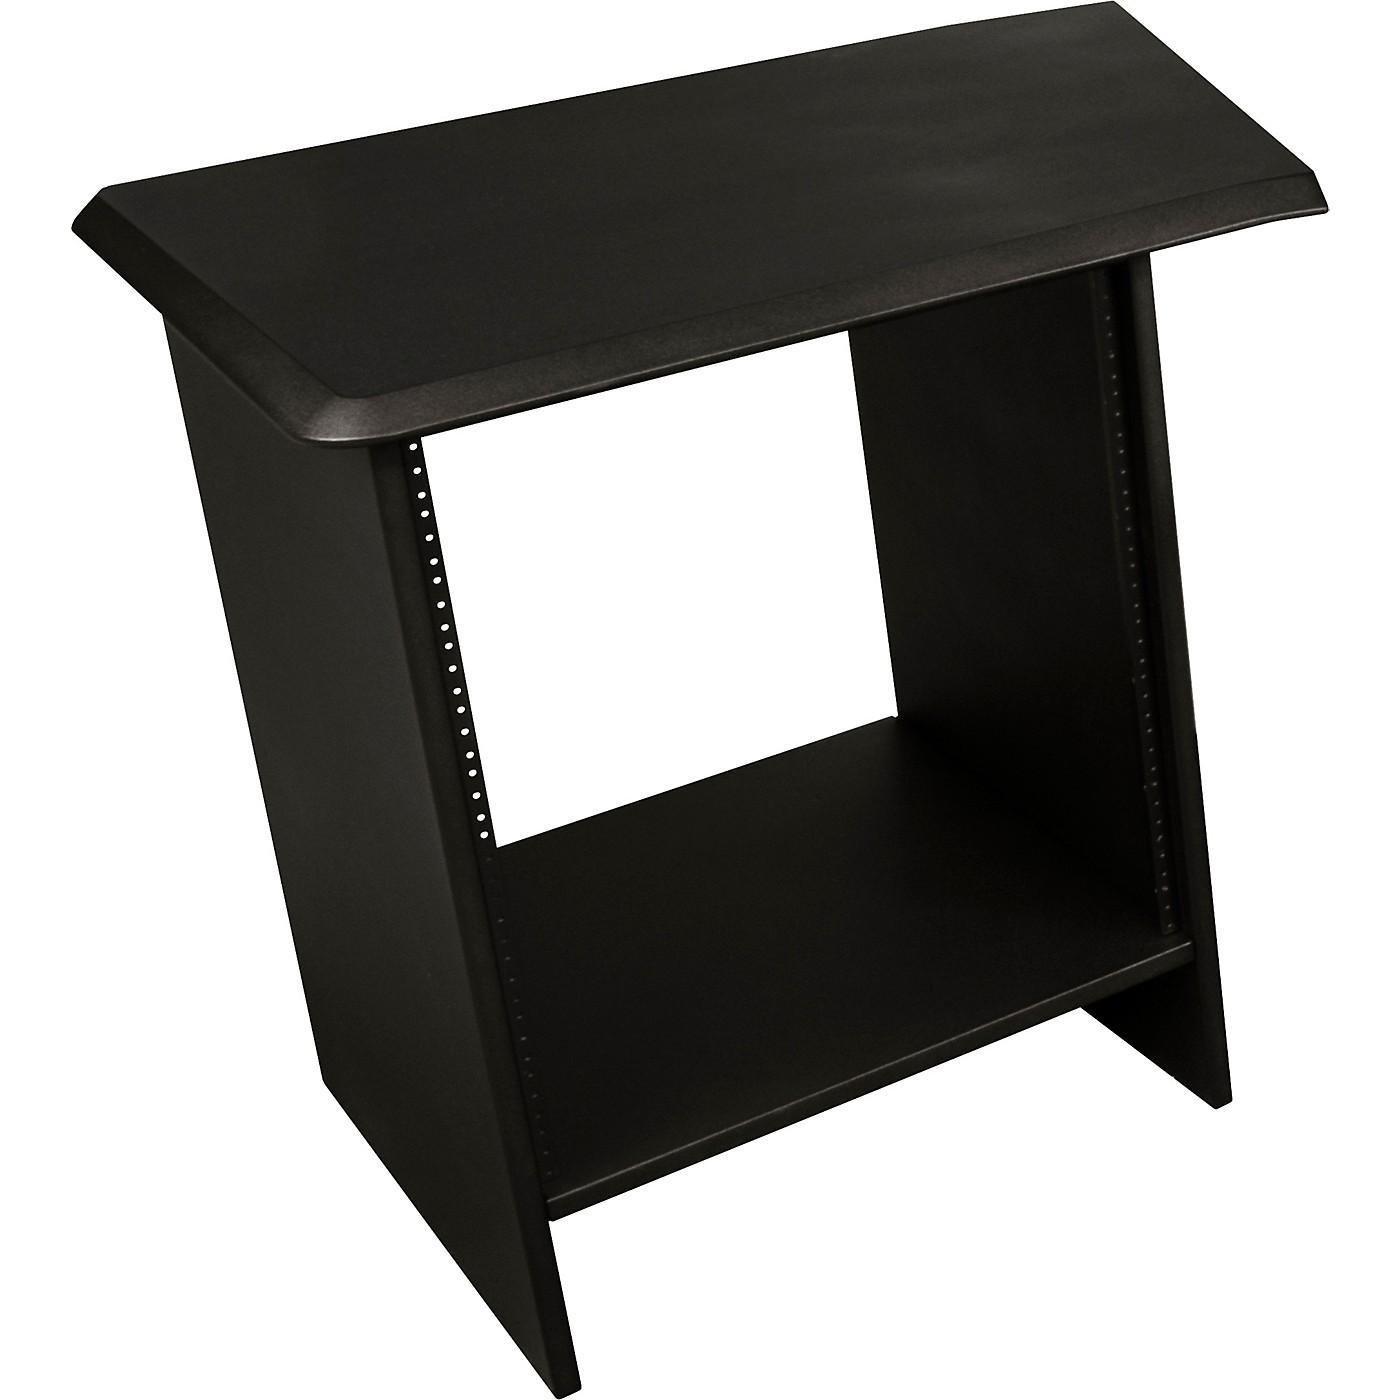 Ultimate Support NUC-R12L Nucleus Series - Studio Desk Table Top - Single 24